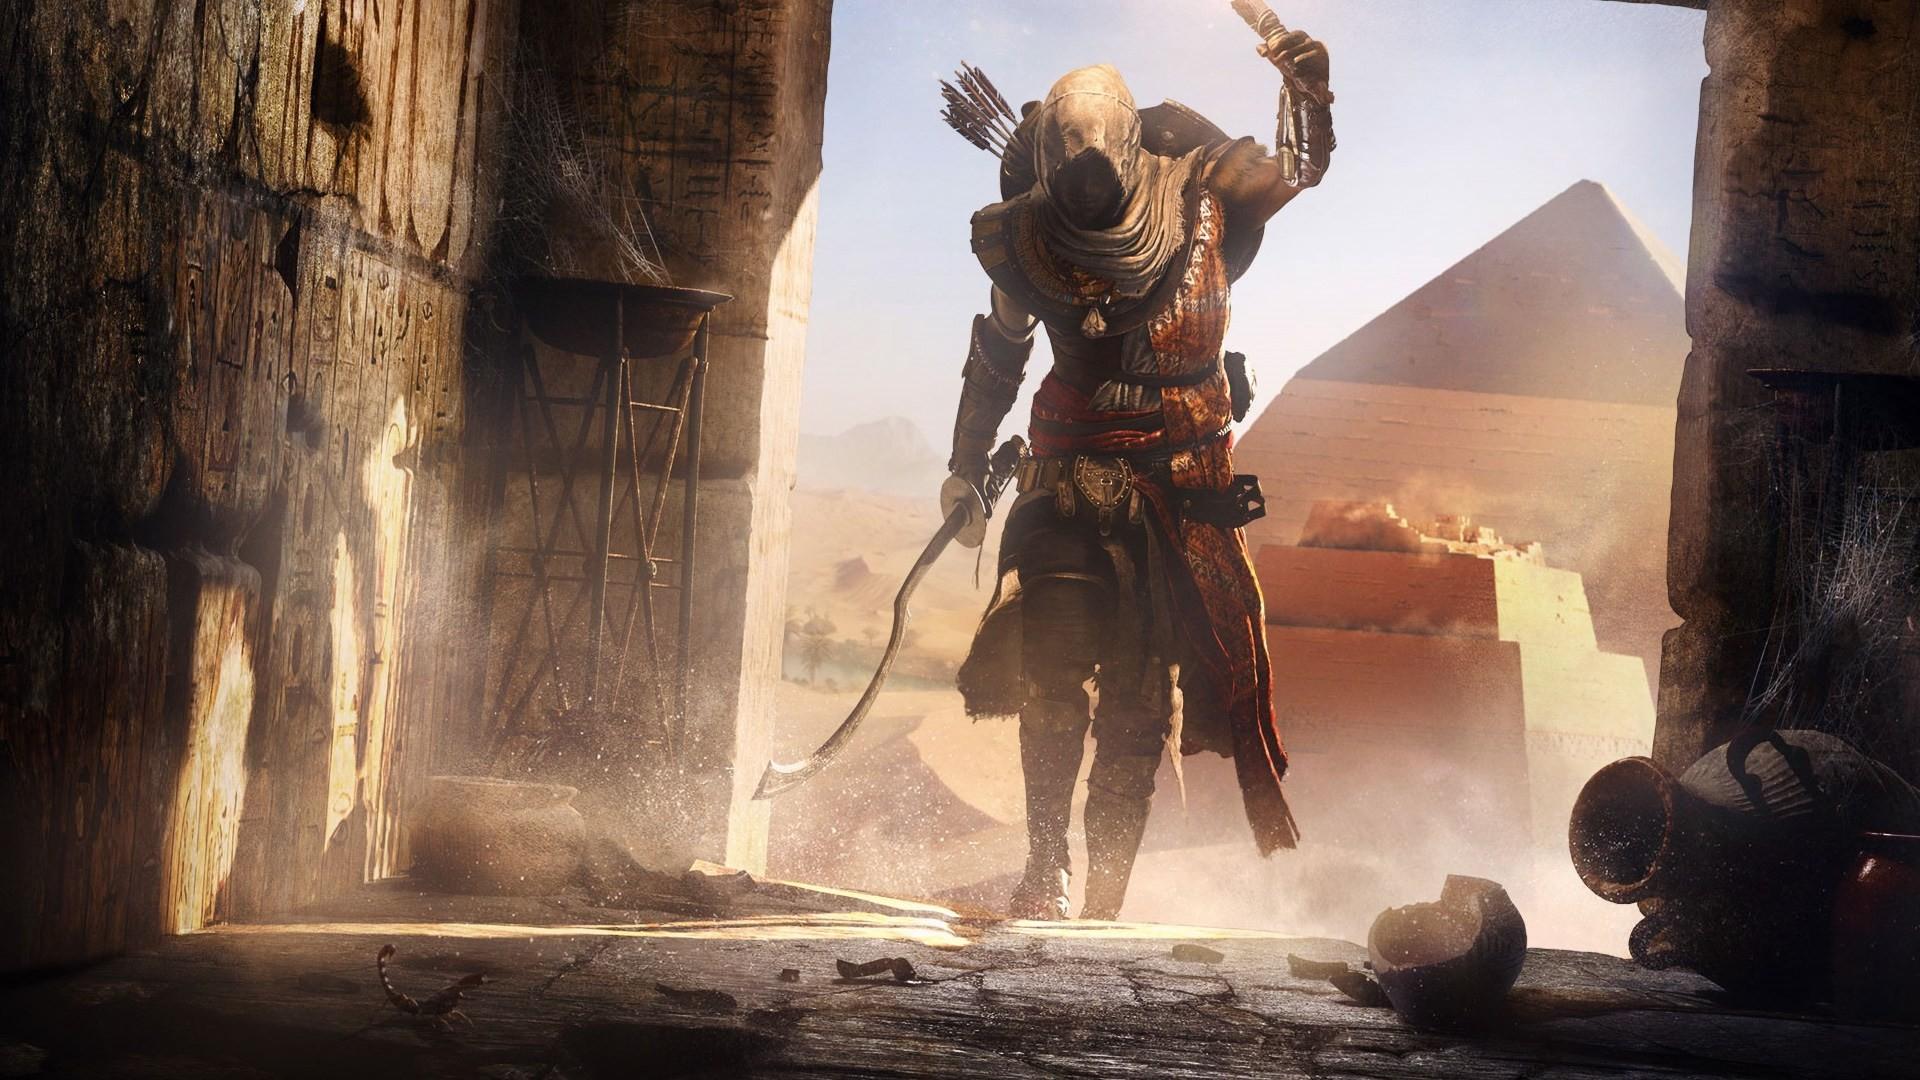 Assassins Creed 2 Wallpaper (82+ images)